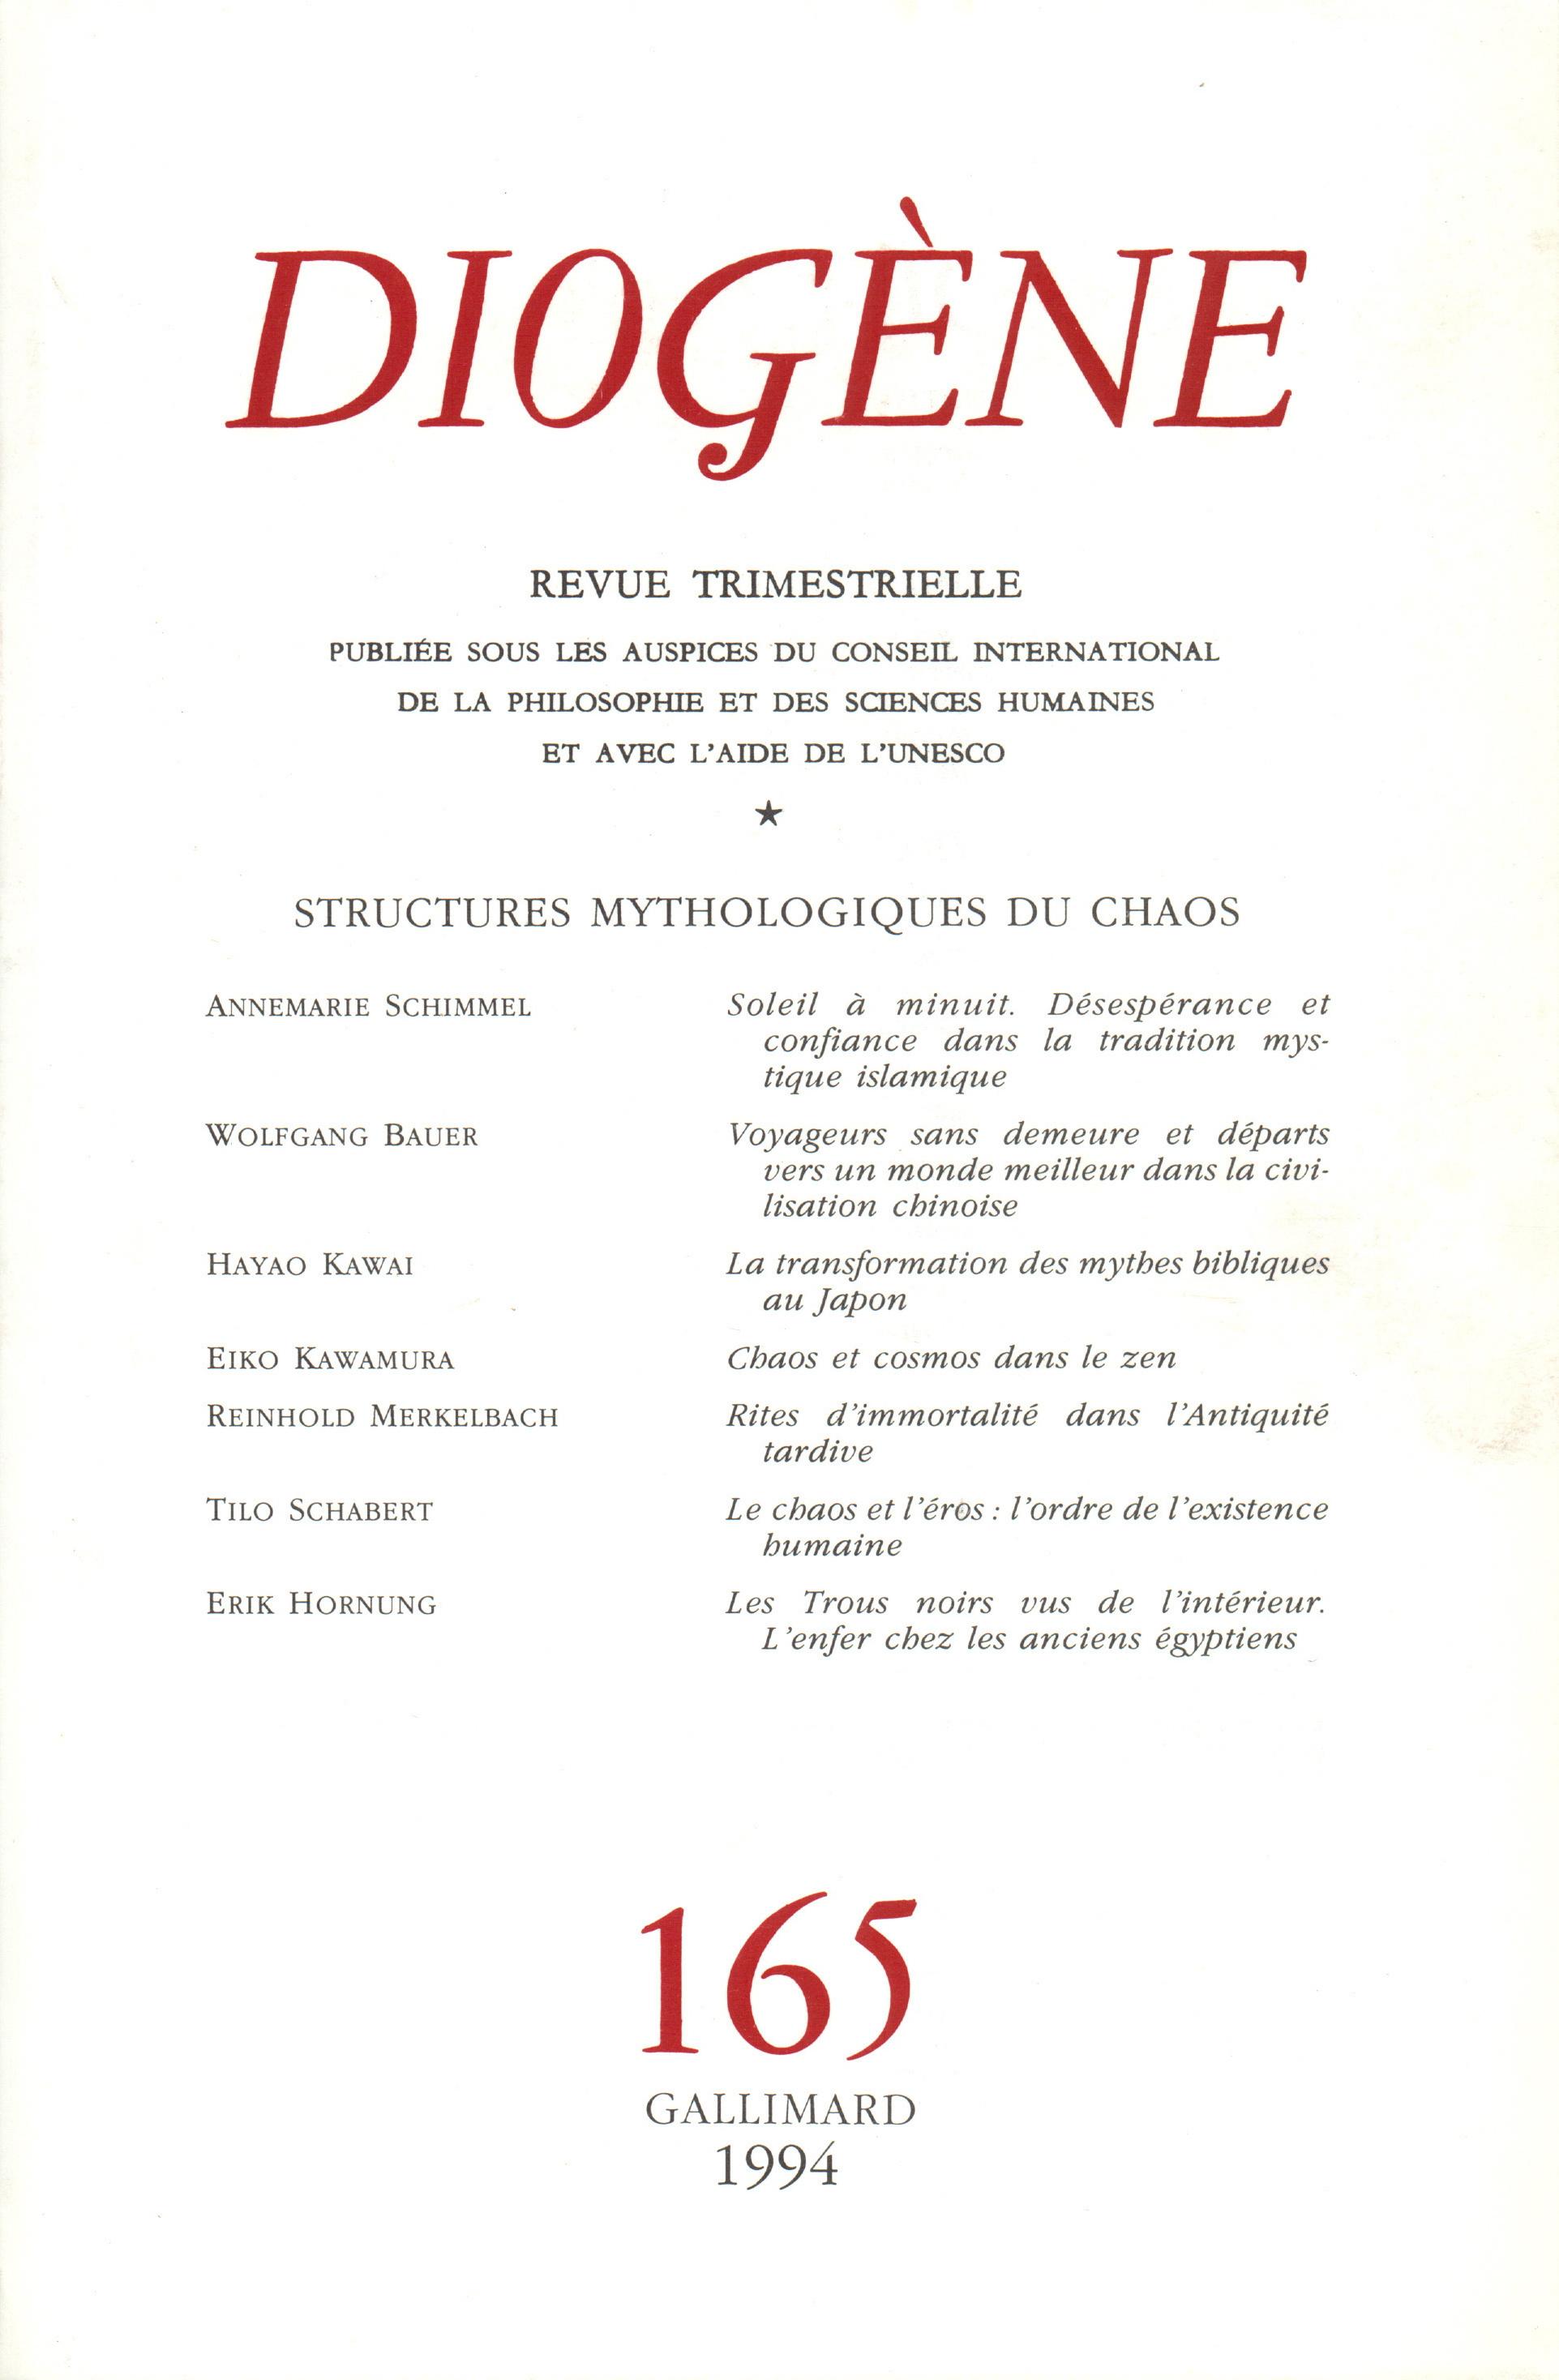 DIOGENE 165